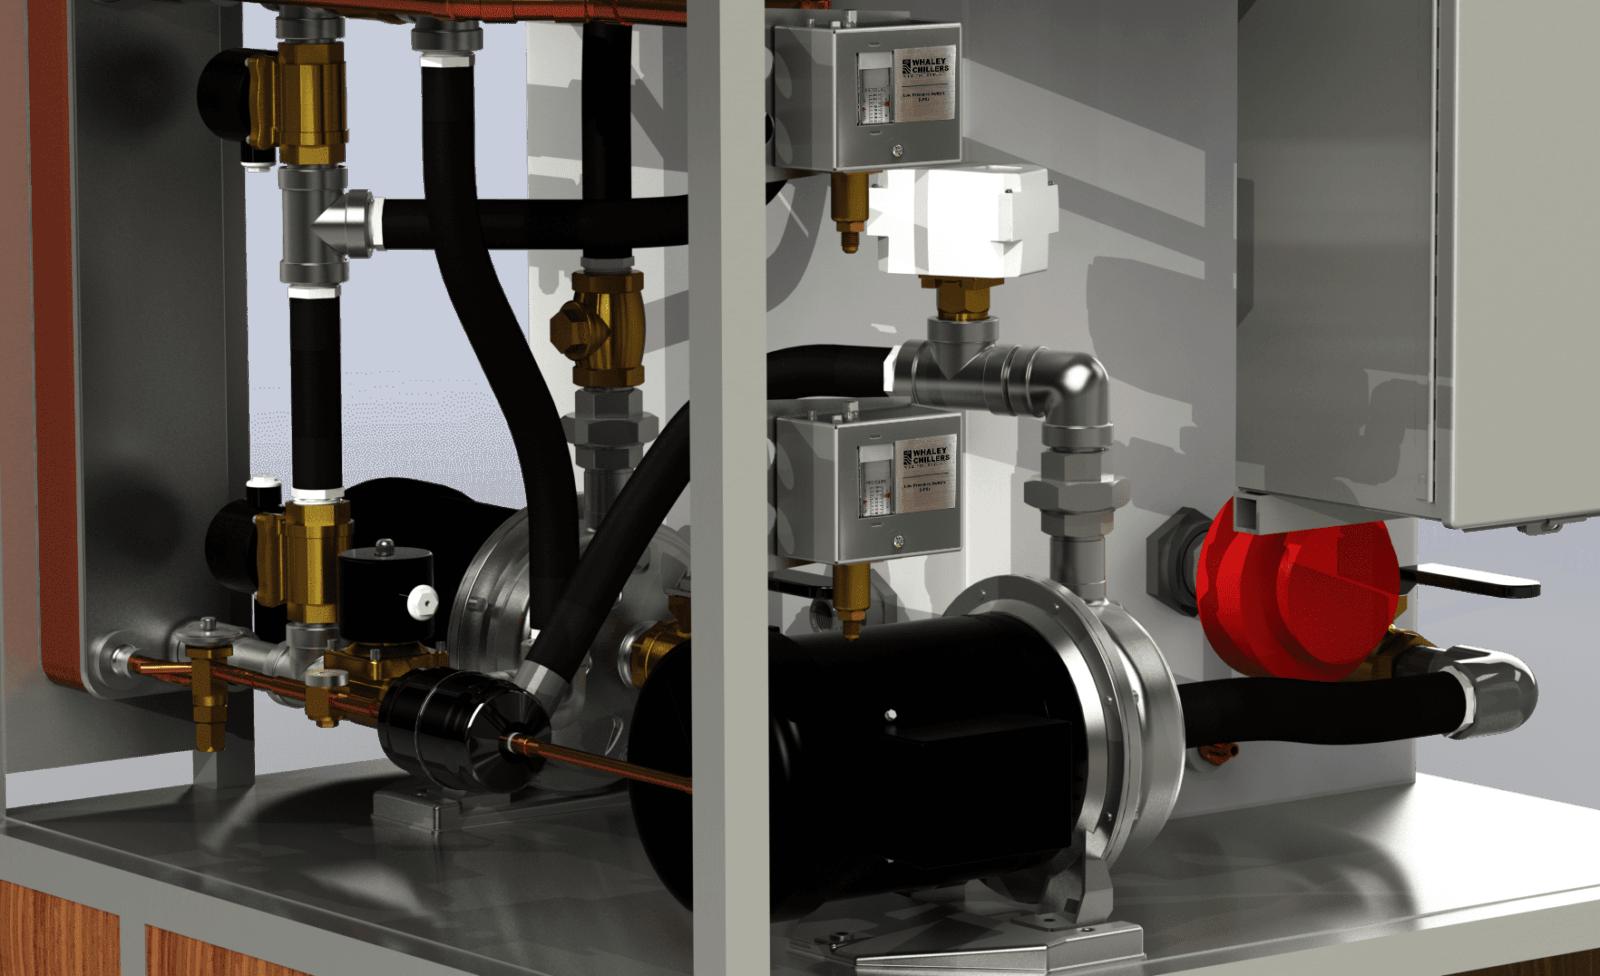 Process Heating Temperature Control